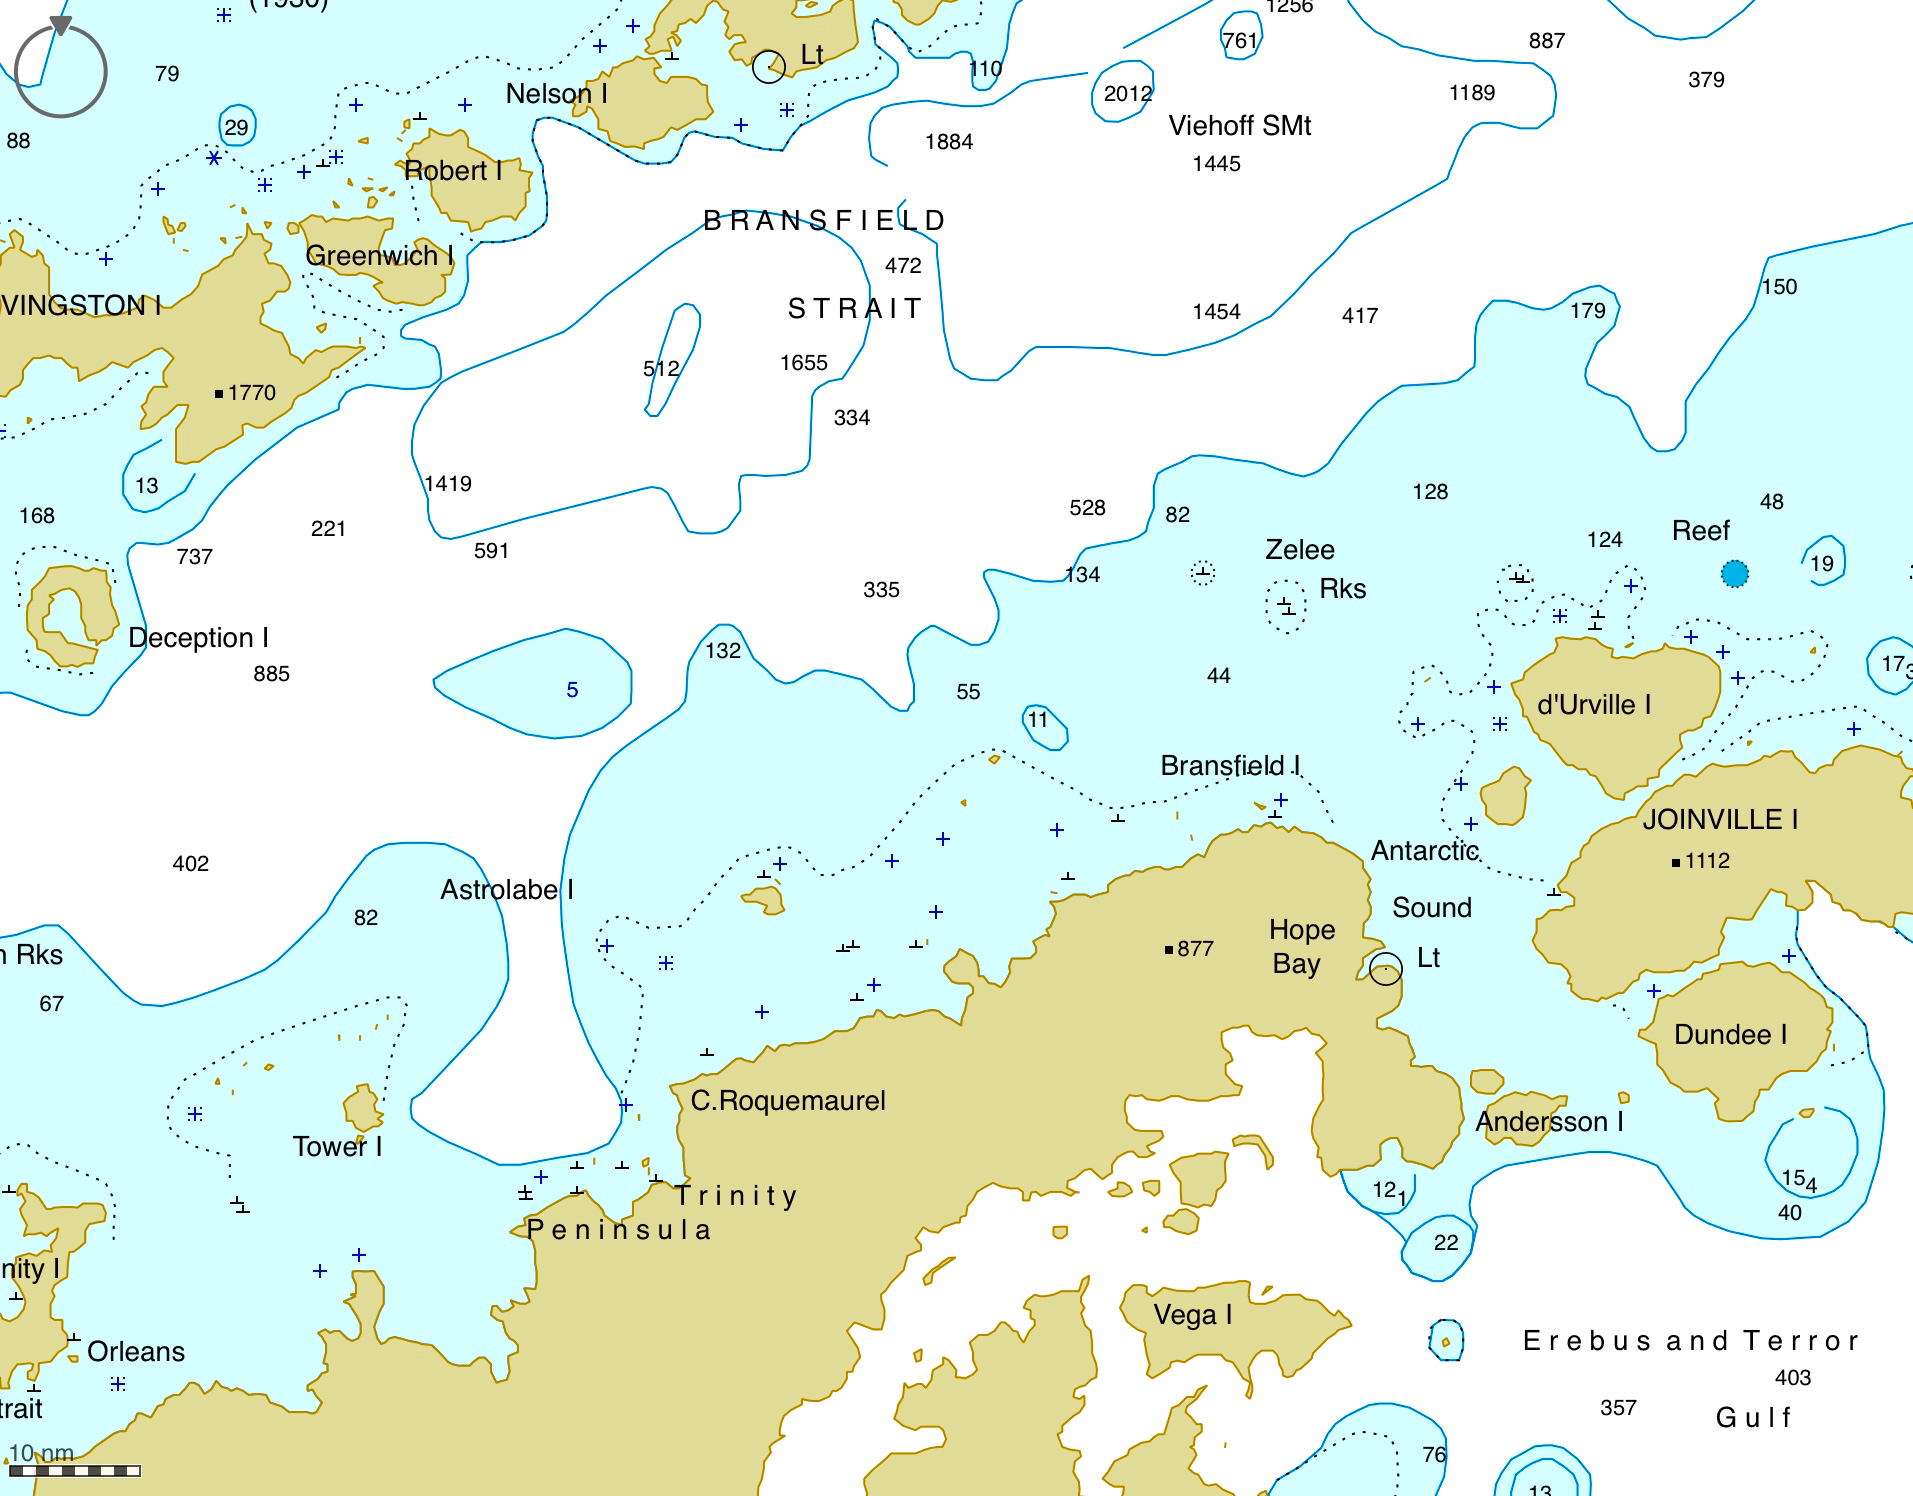 Navigation chart of Bransfield Strait